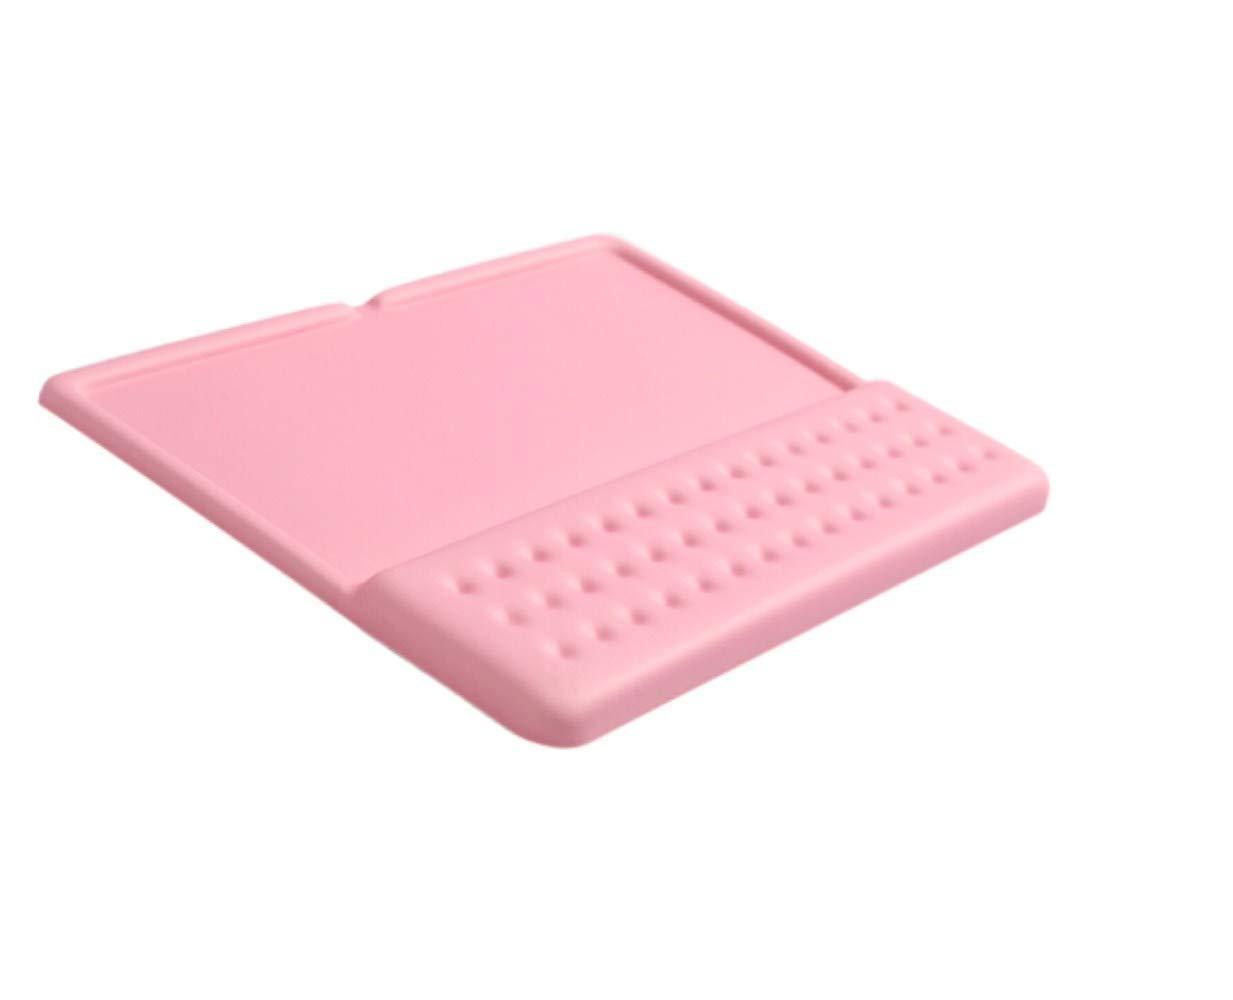 Black MLA22LL//A BUBM Wrist Rest Support Keyboard Pad for Apple Magic Keyboard